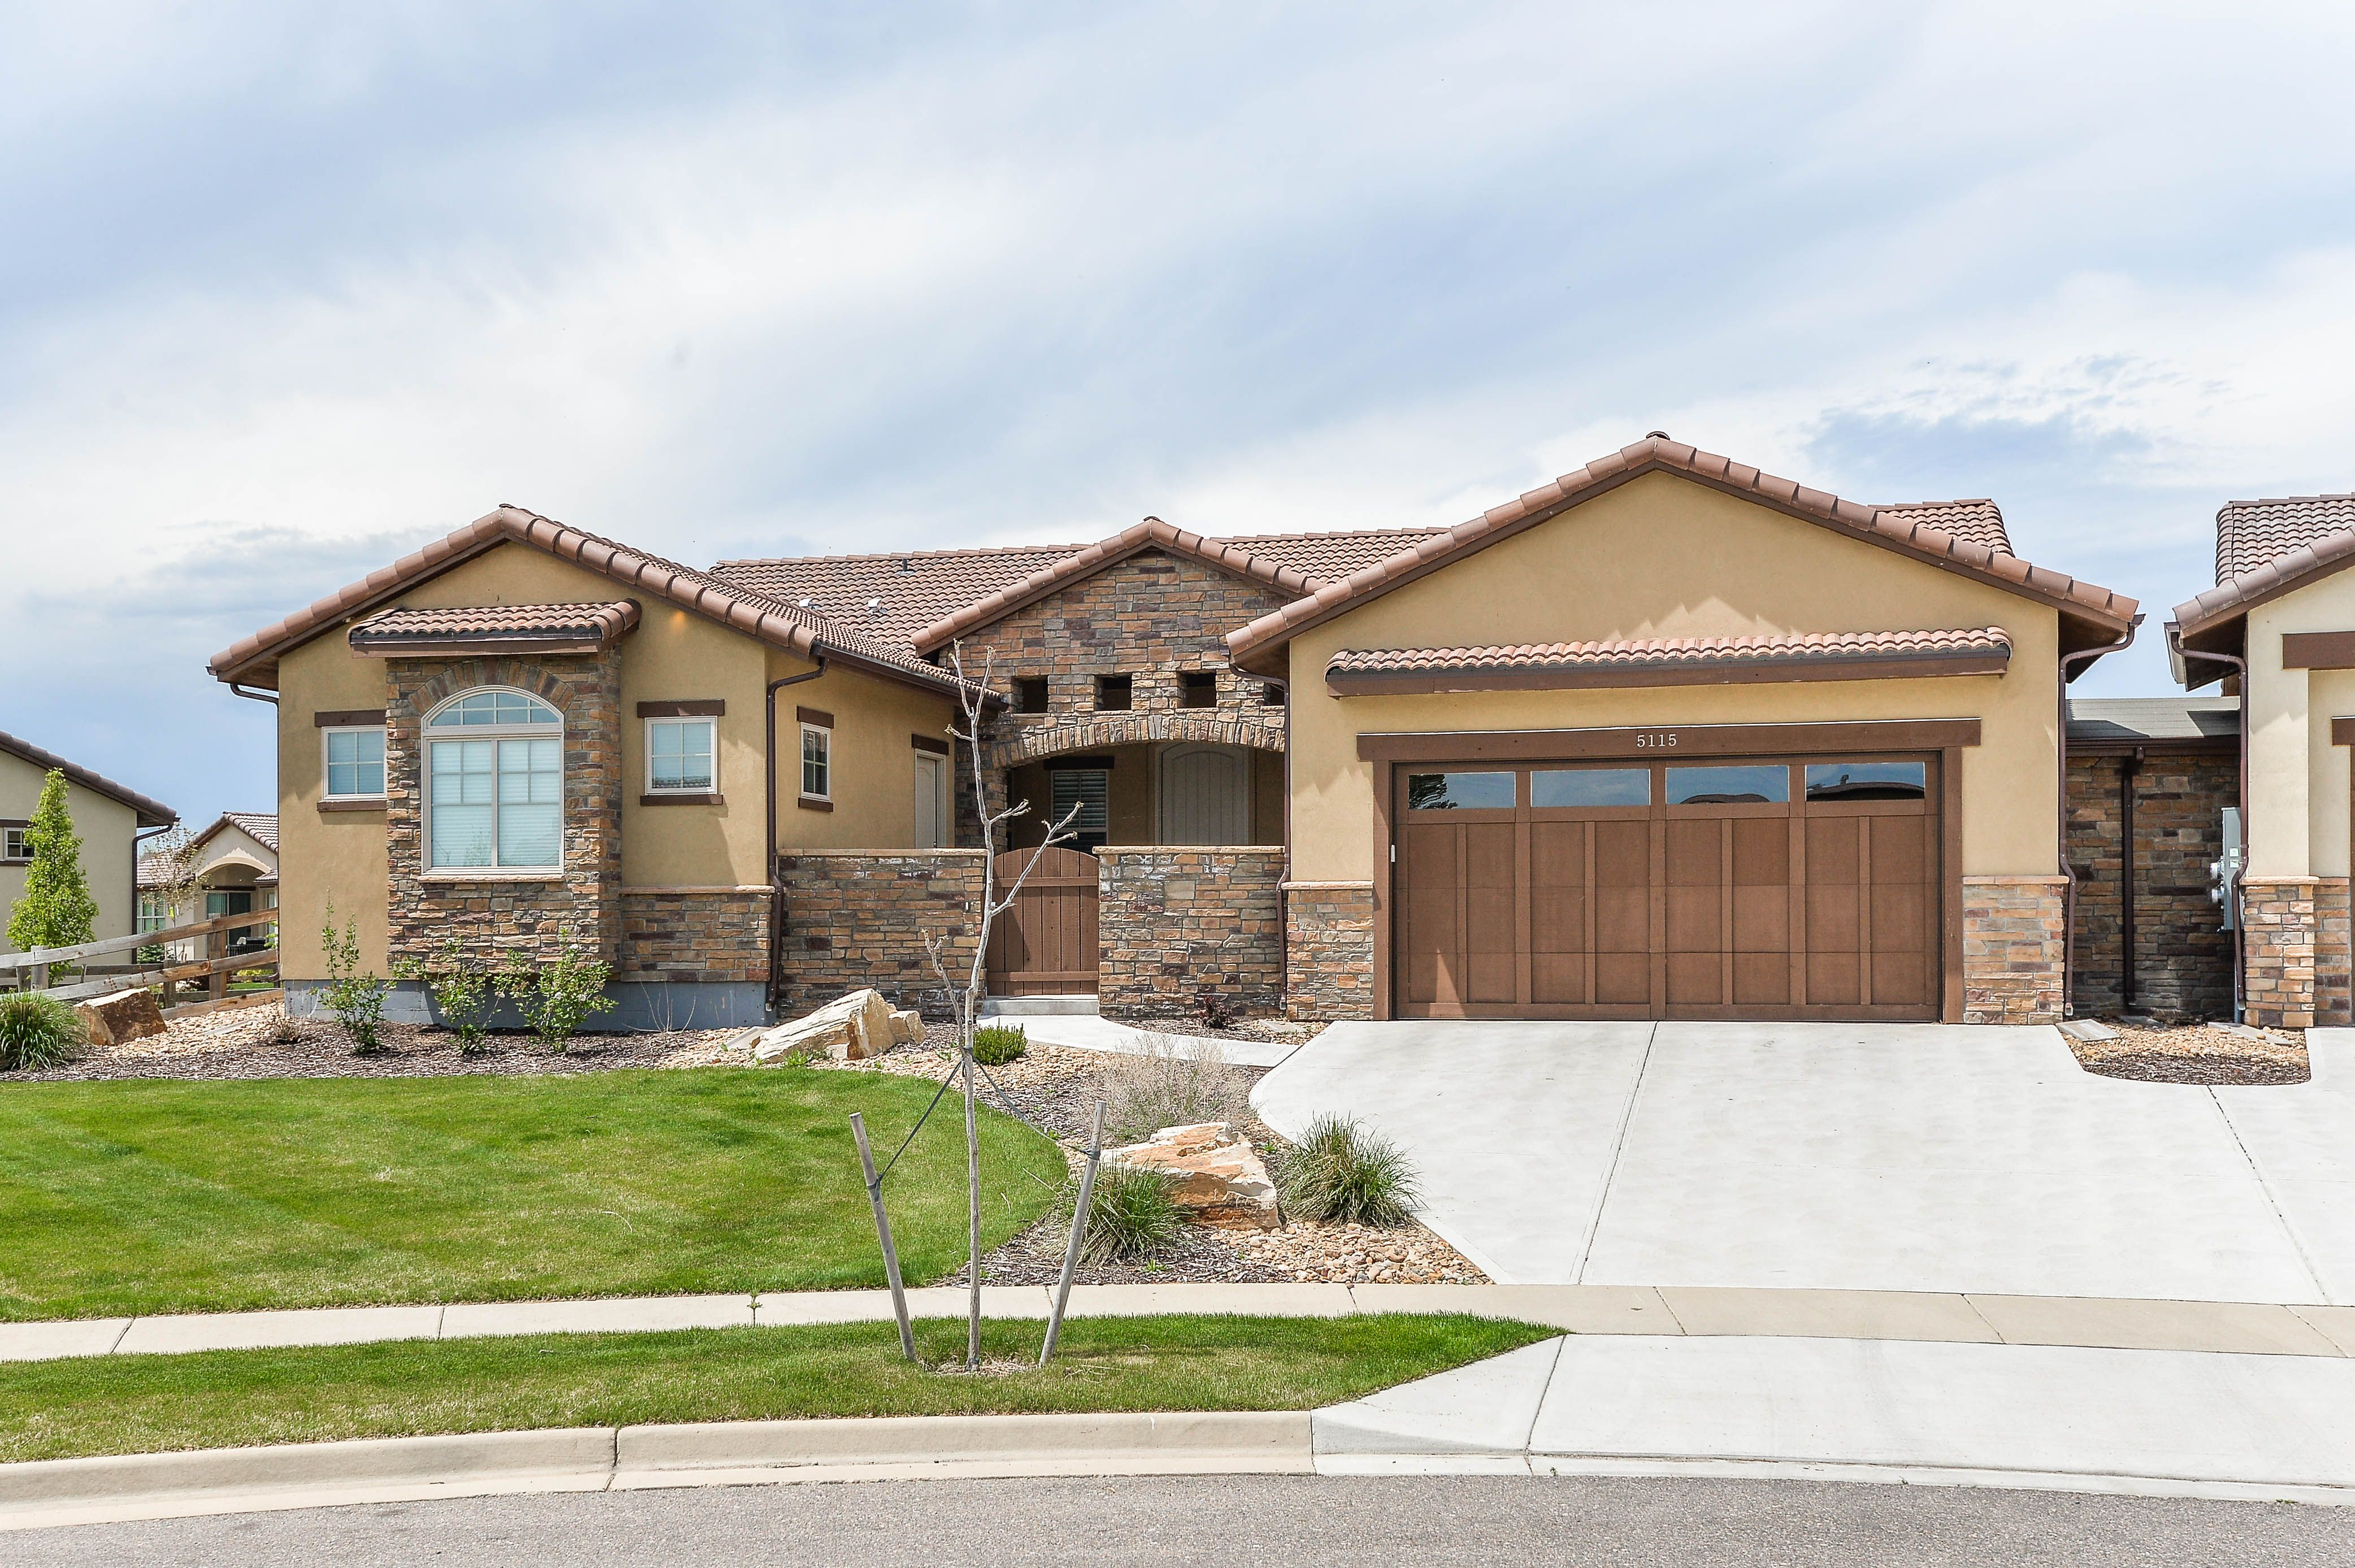 Patio Home, Sunrise Ridge Living, Spanish Style Home, Stucco, Fort Collins,